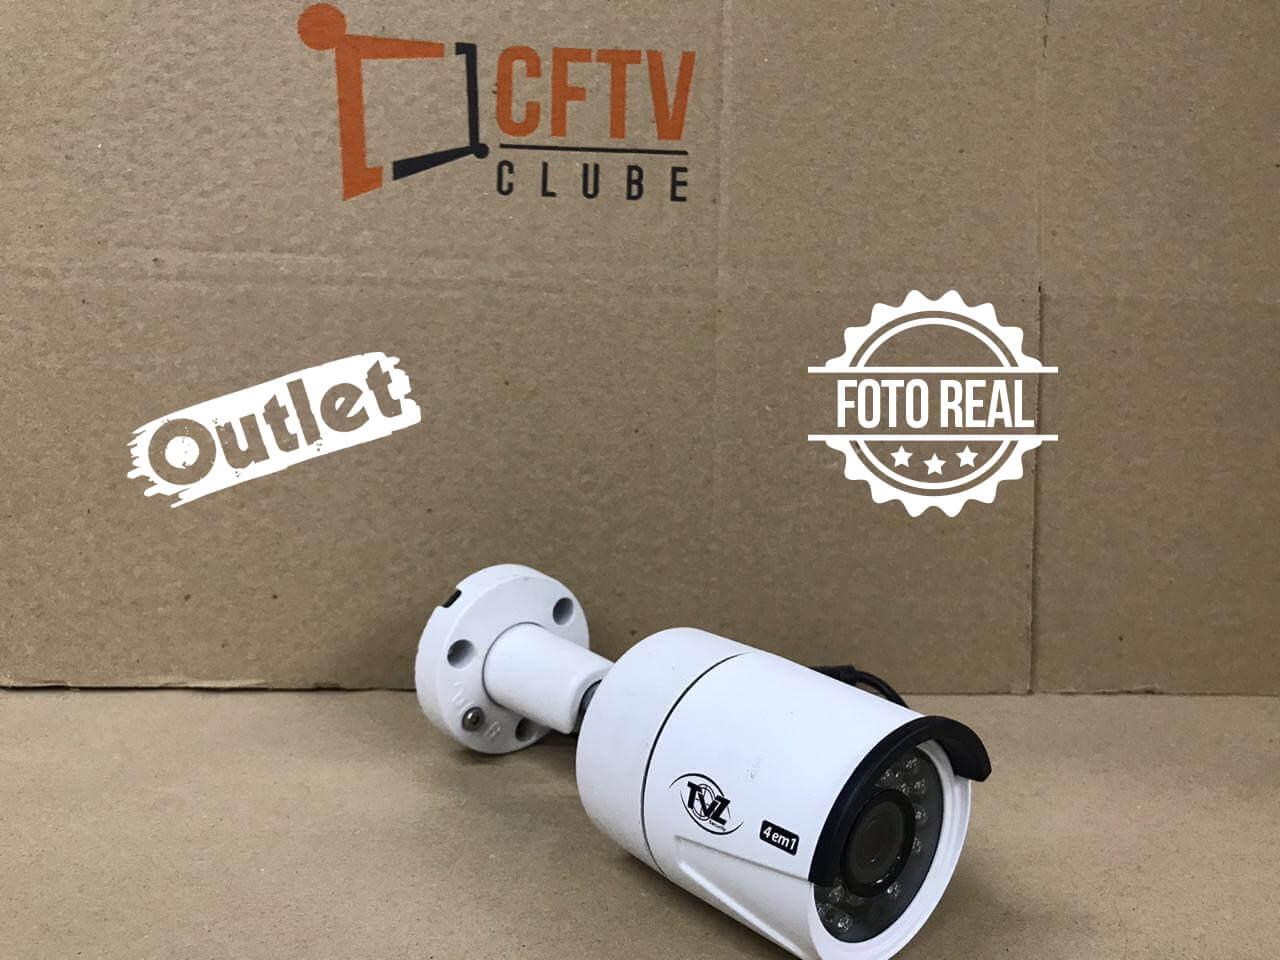 Outlet - Câmera TVZ Bullet Flex HD 4BL2 Full HD (2.0MP | 1080p | 3.6mm | Plast)  - CFTV Clube | Brasil